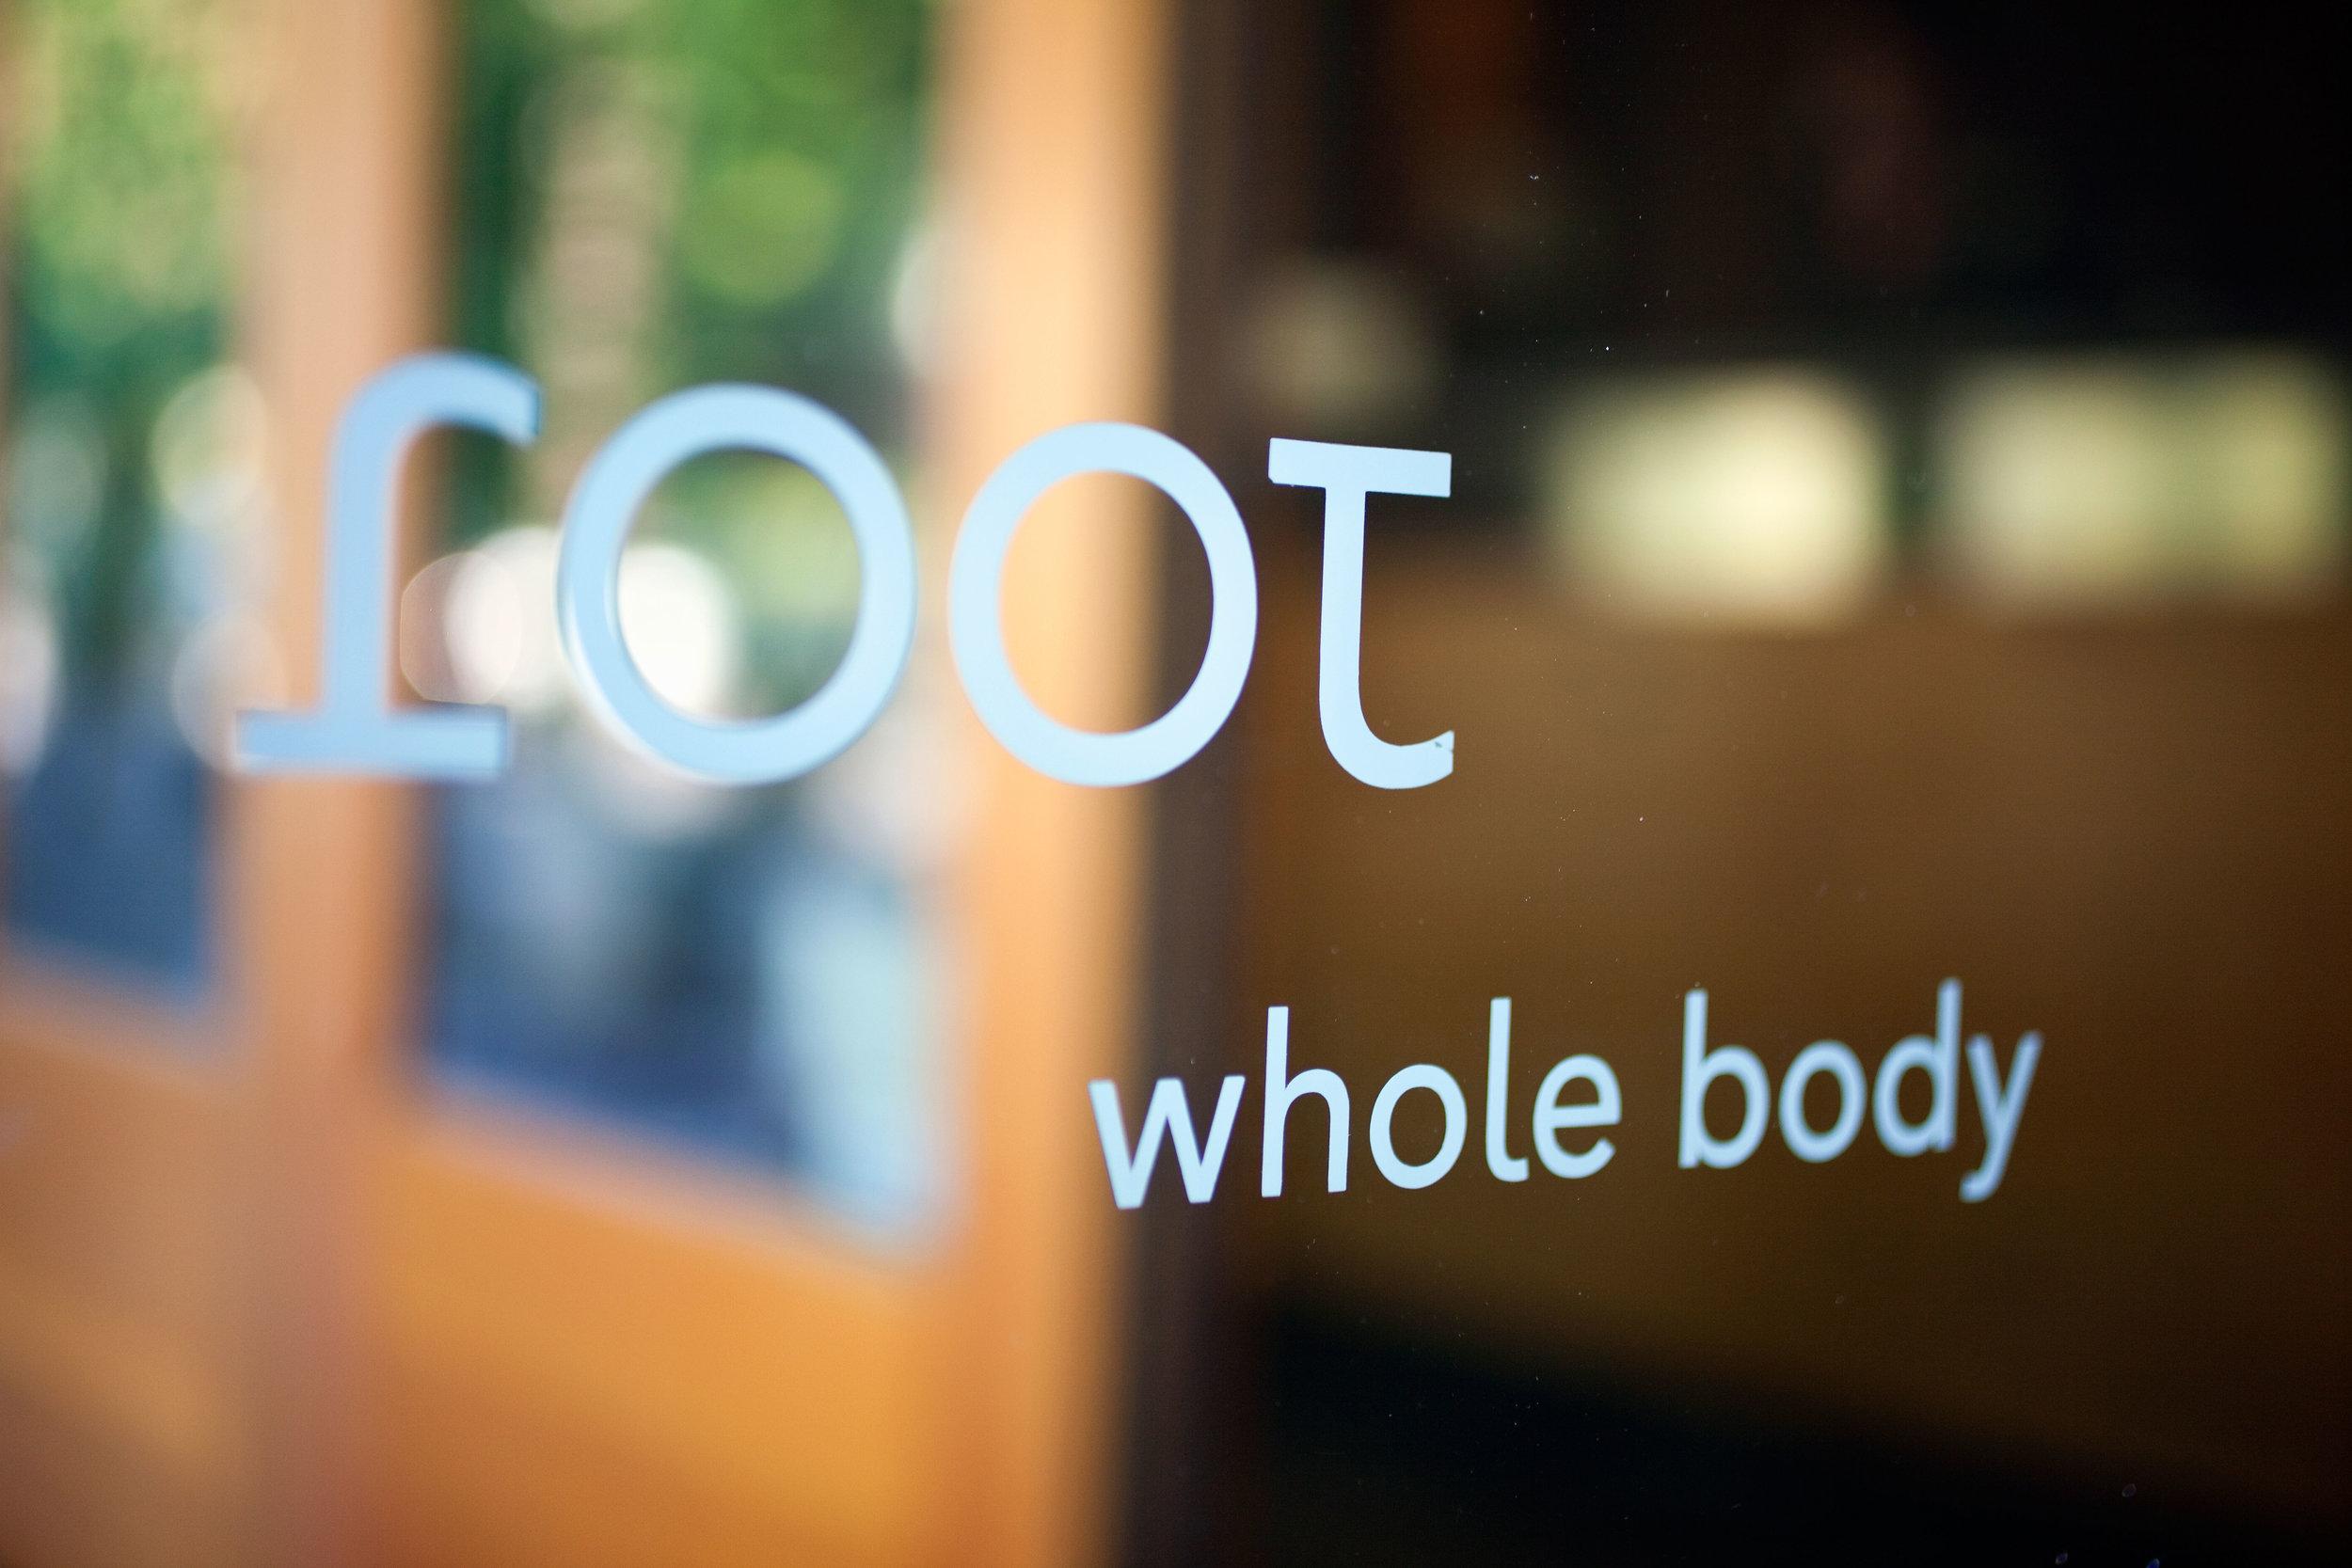 RootWholeBody010